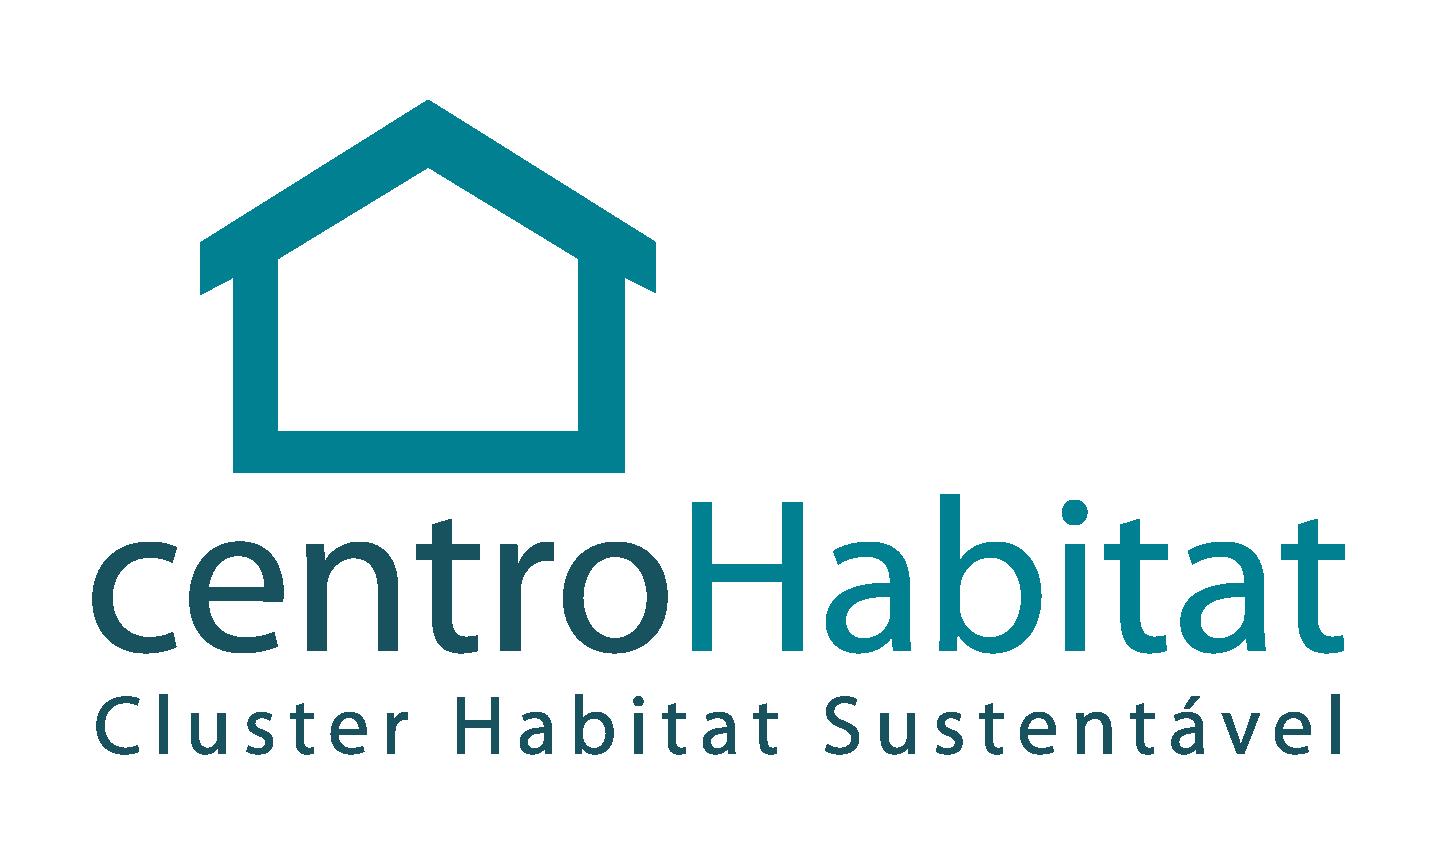 Cluster Habitat Sustentável